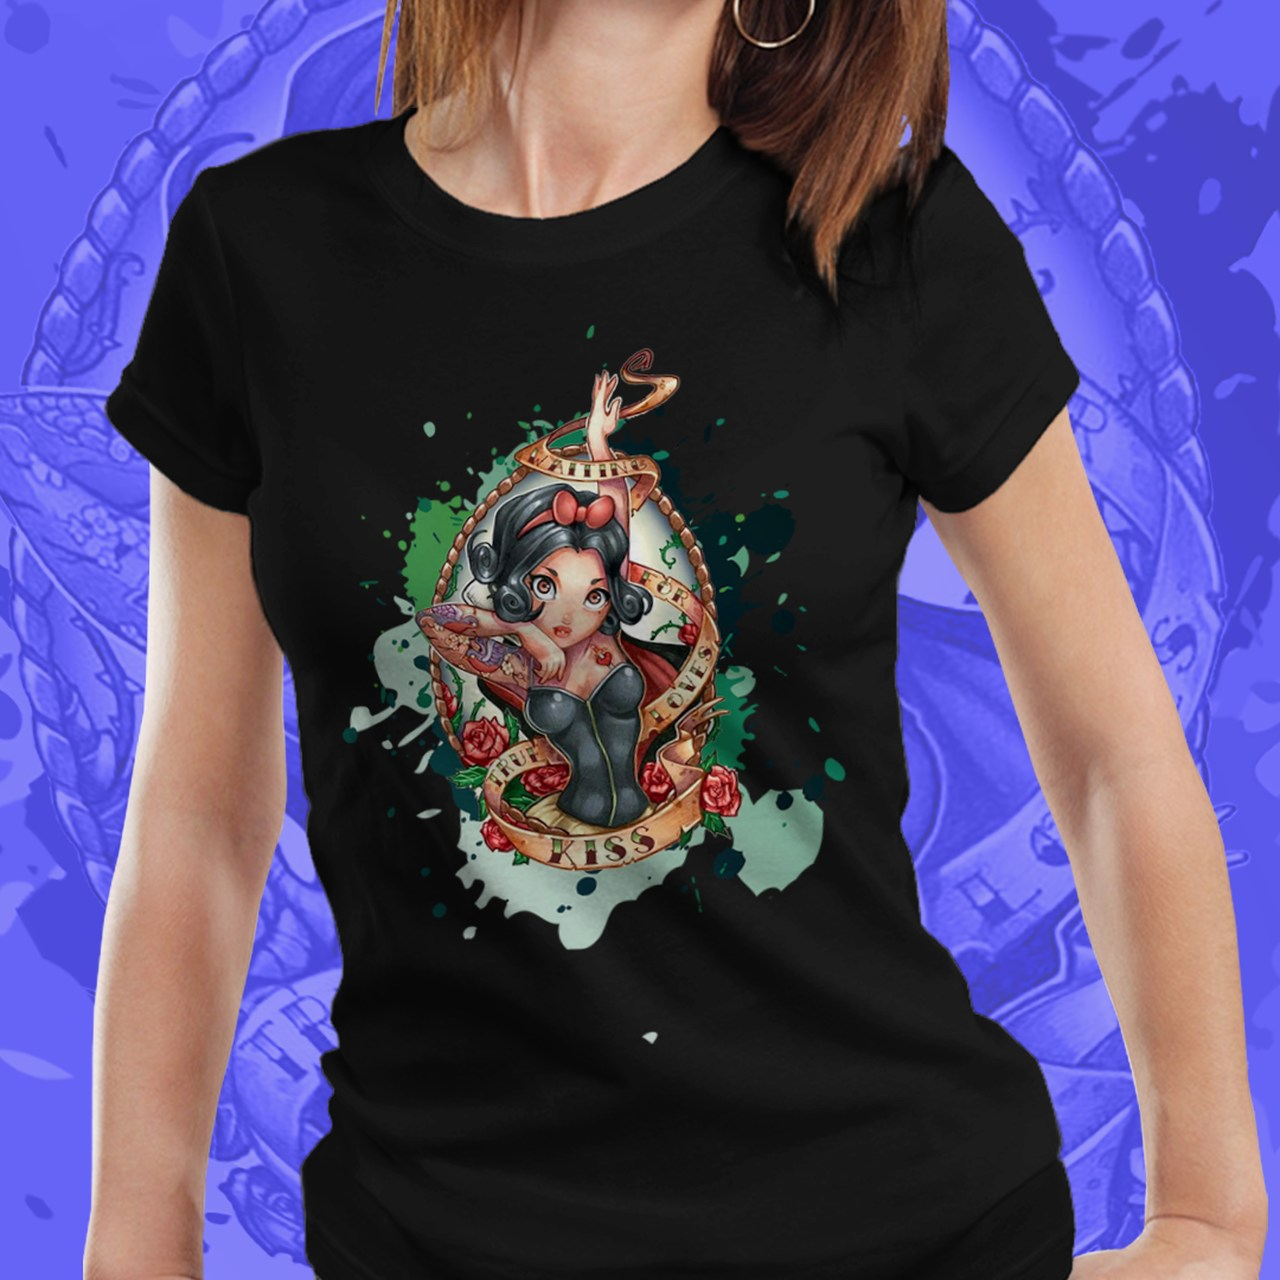 Camiseta Feminina Branca de Neve - Disney (Preto) - EV